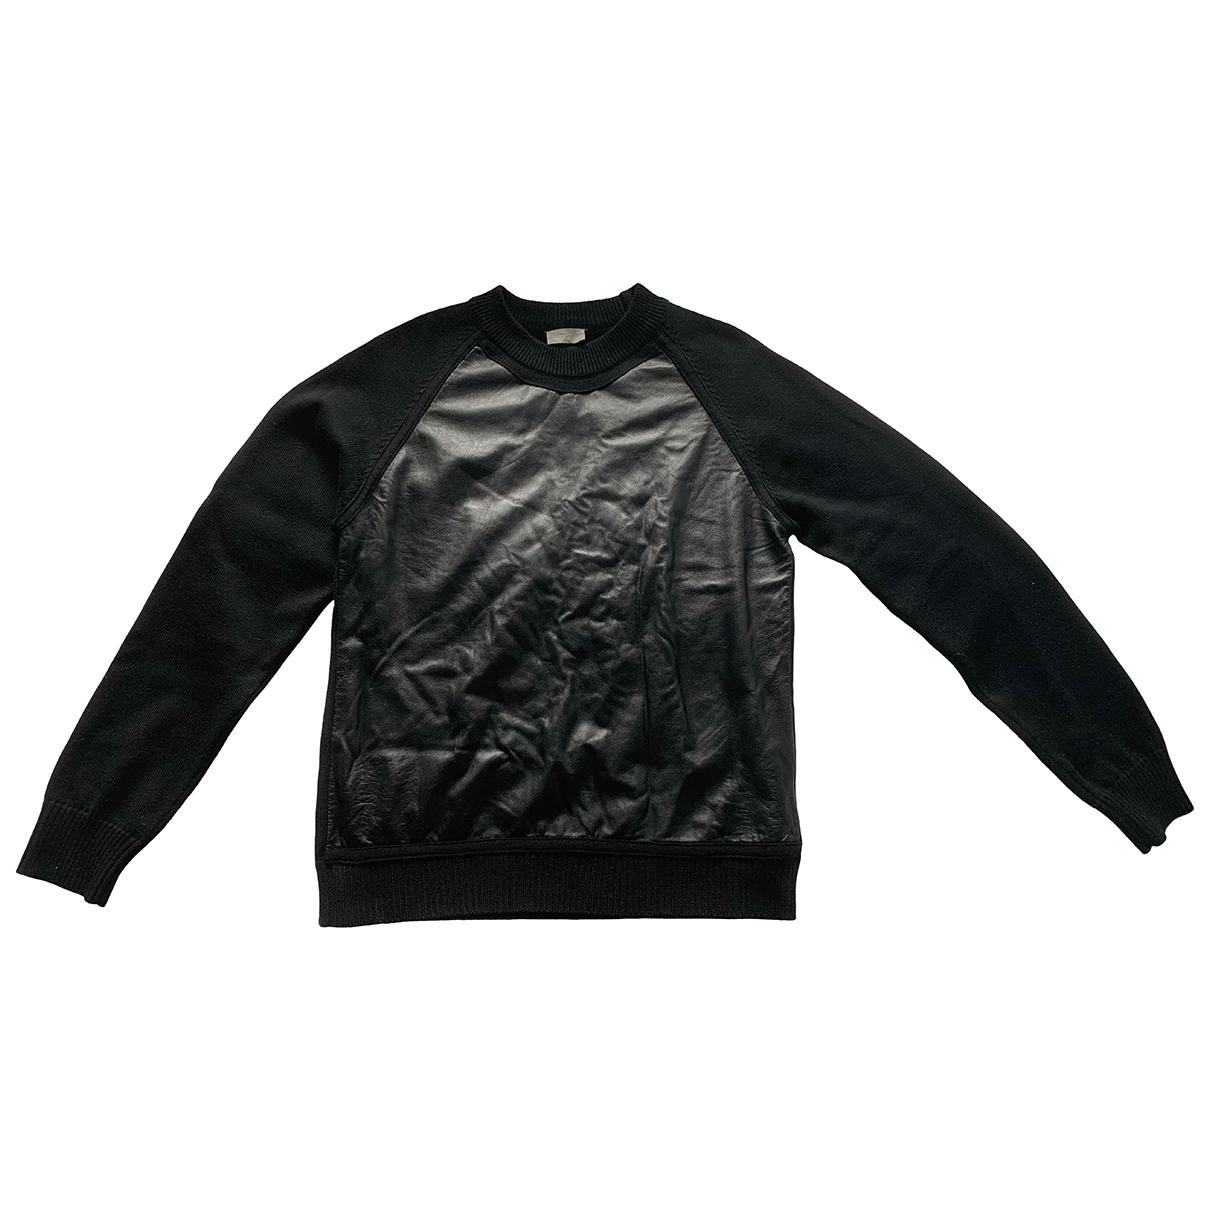 Dior Homme \N Black Leather Knitwear & Sweatshirts for Men L International